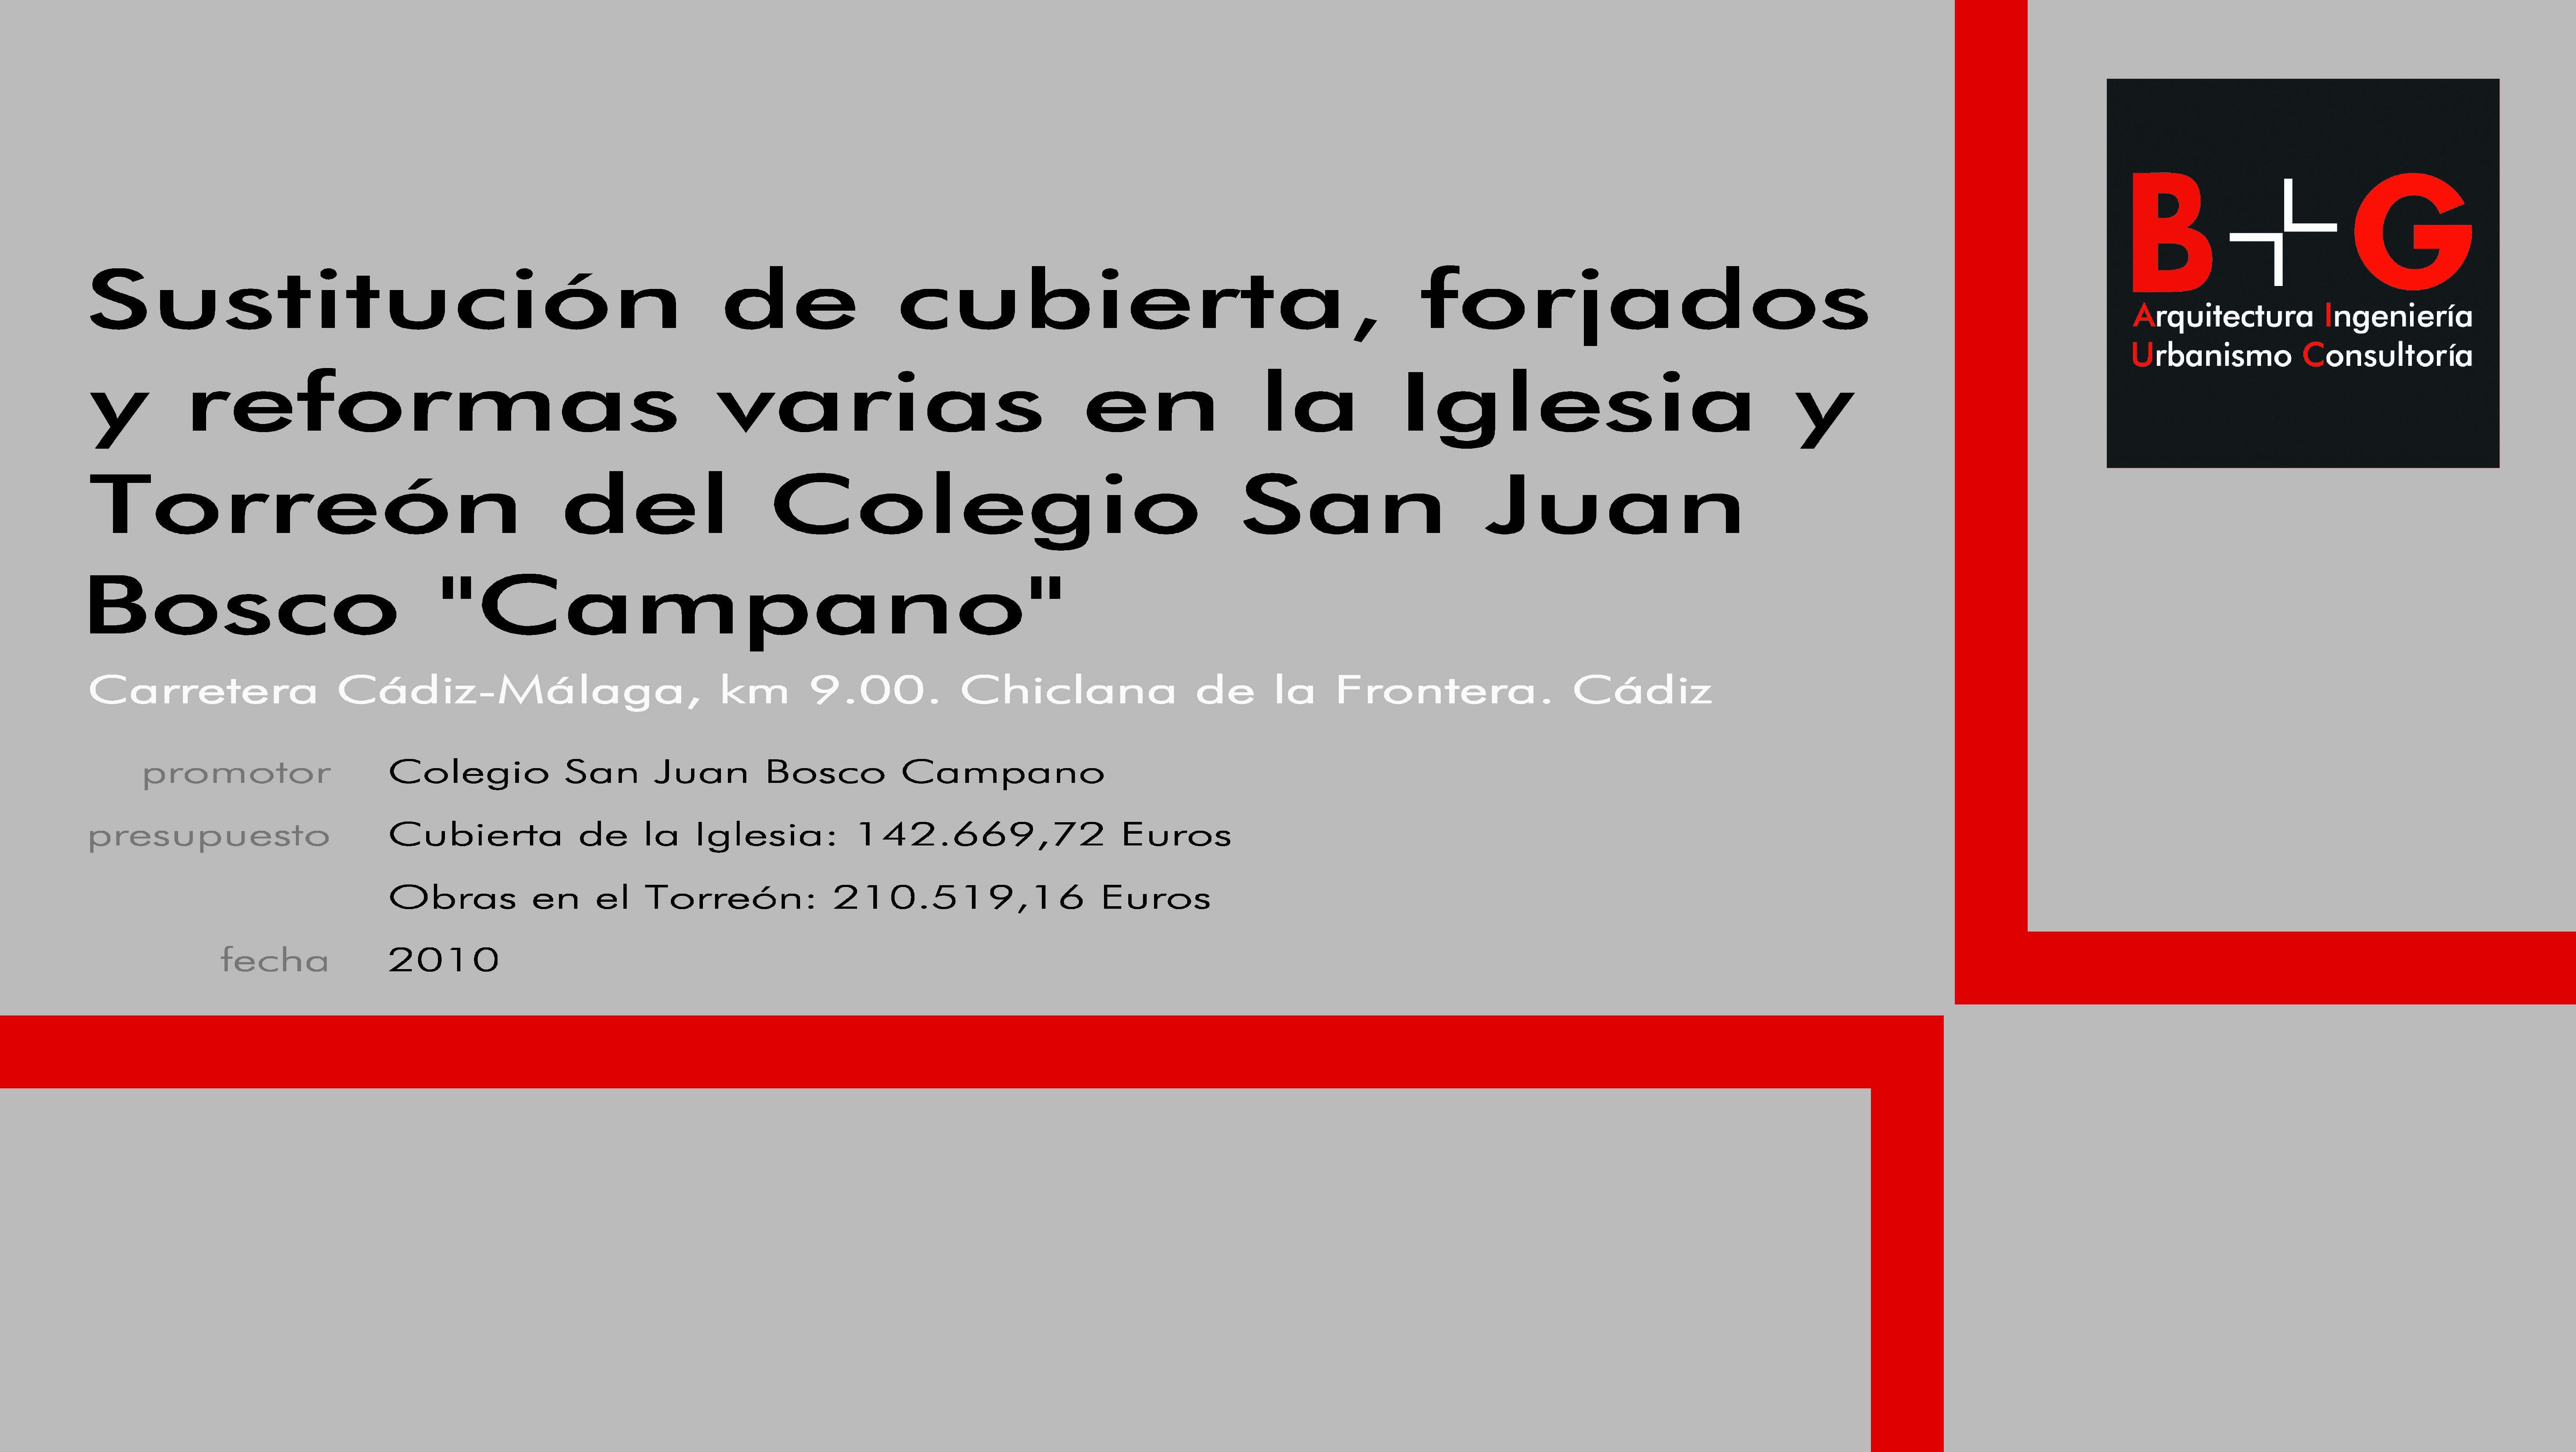 Colegio arquitectos de cadiz cool colegio arquitectos de cadiz with colegio arquitectos de - Colegio de arquitectos cadiz ...